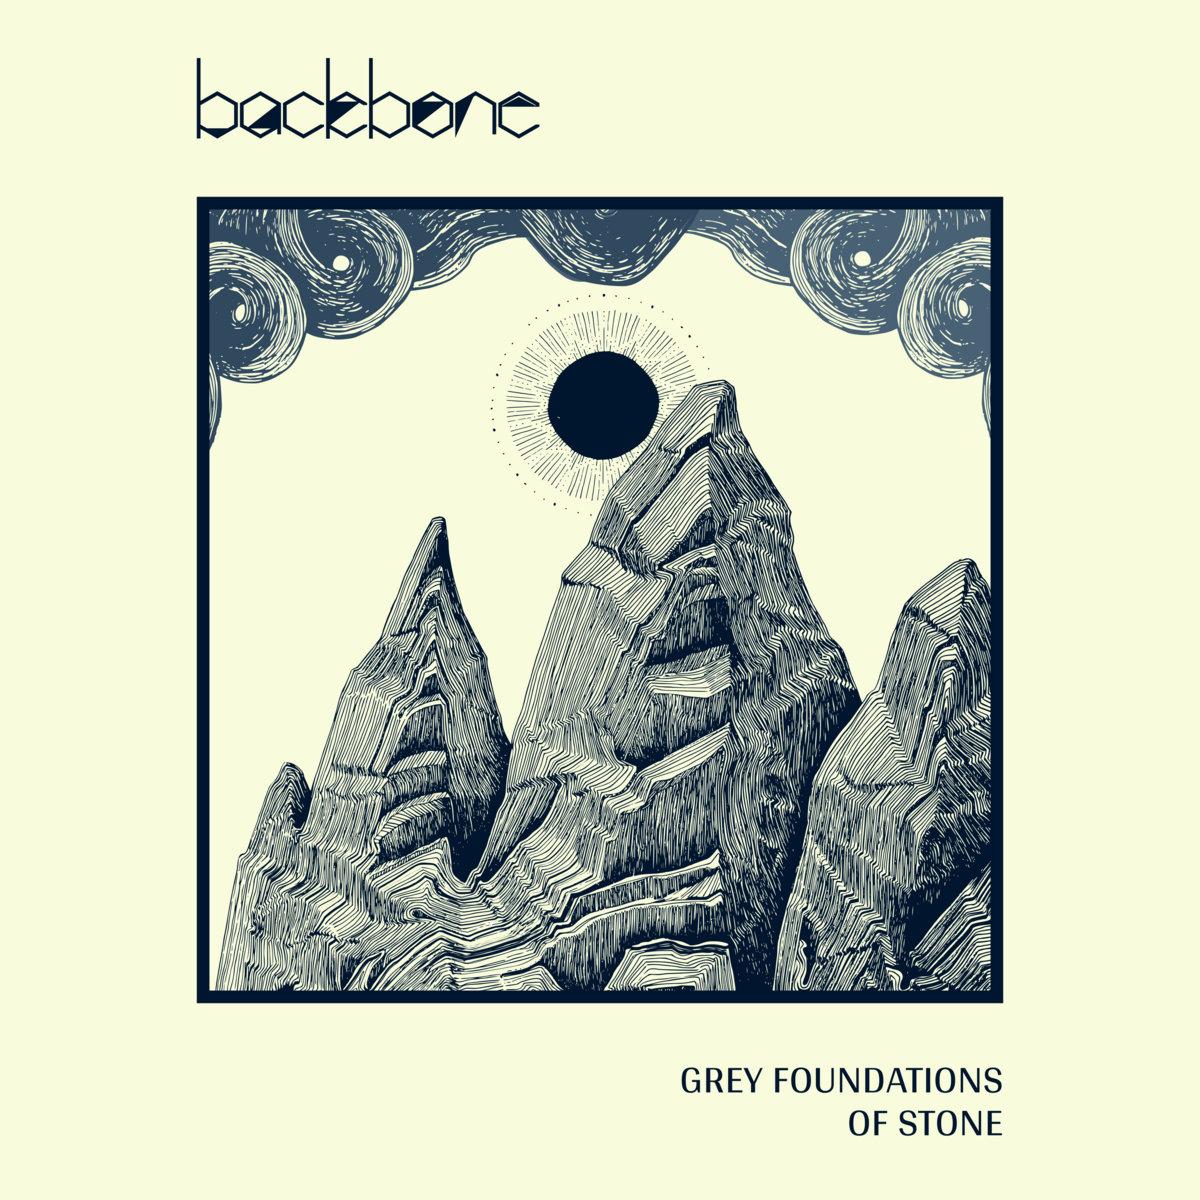 Backbone: Grey Foundations of Stone